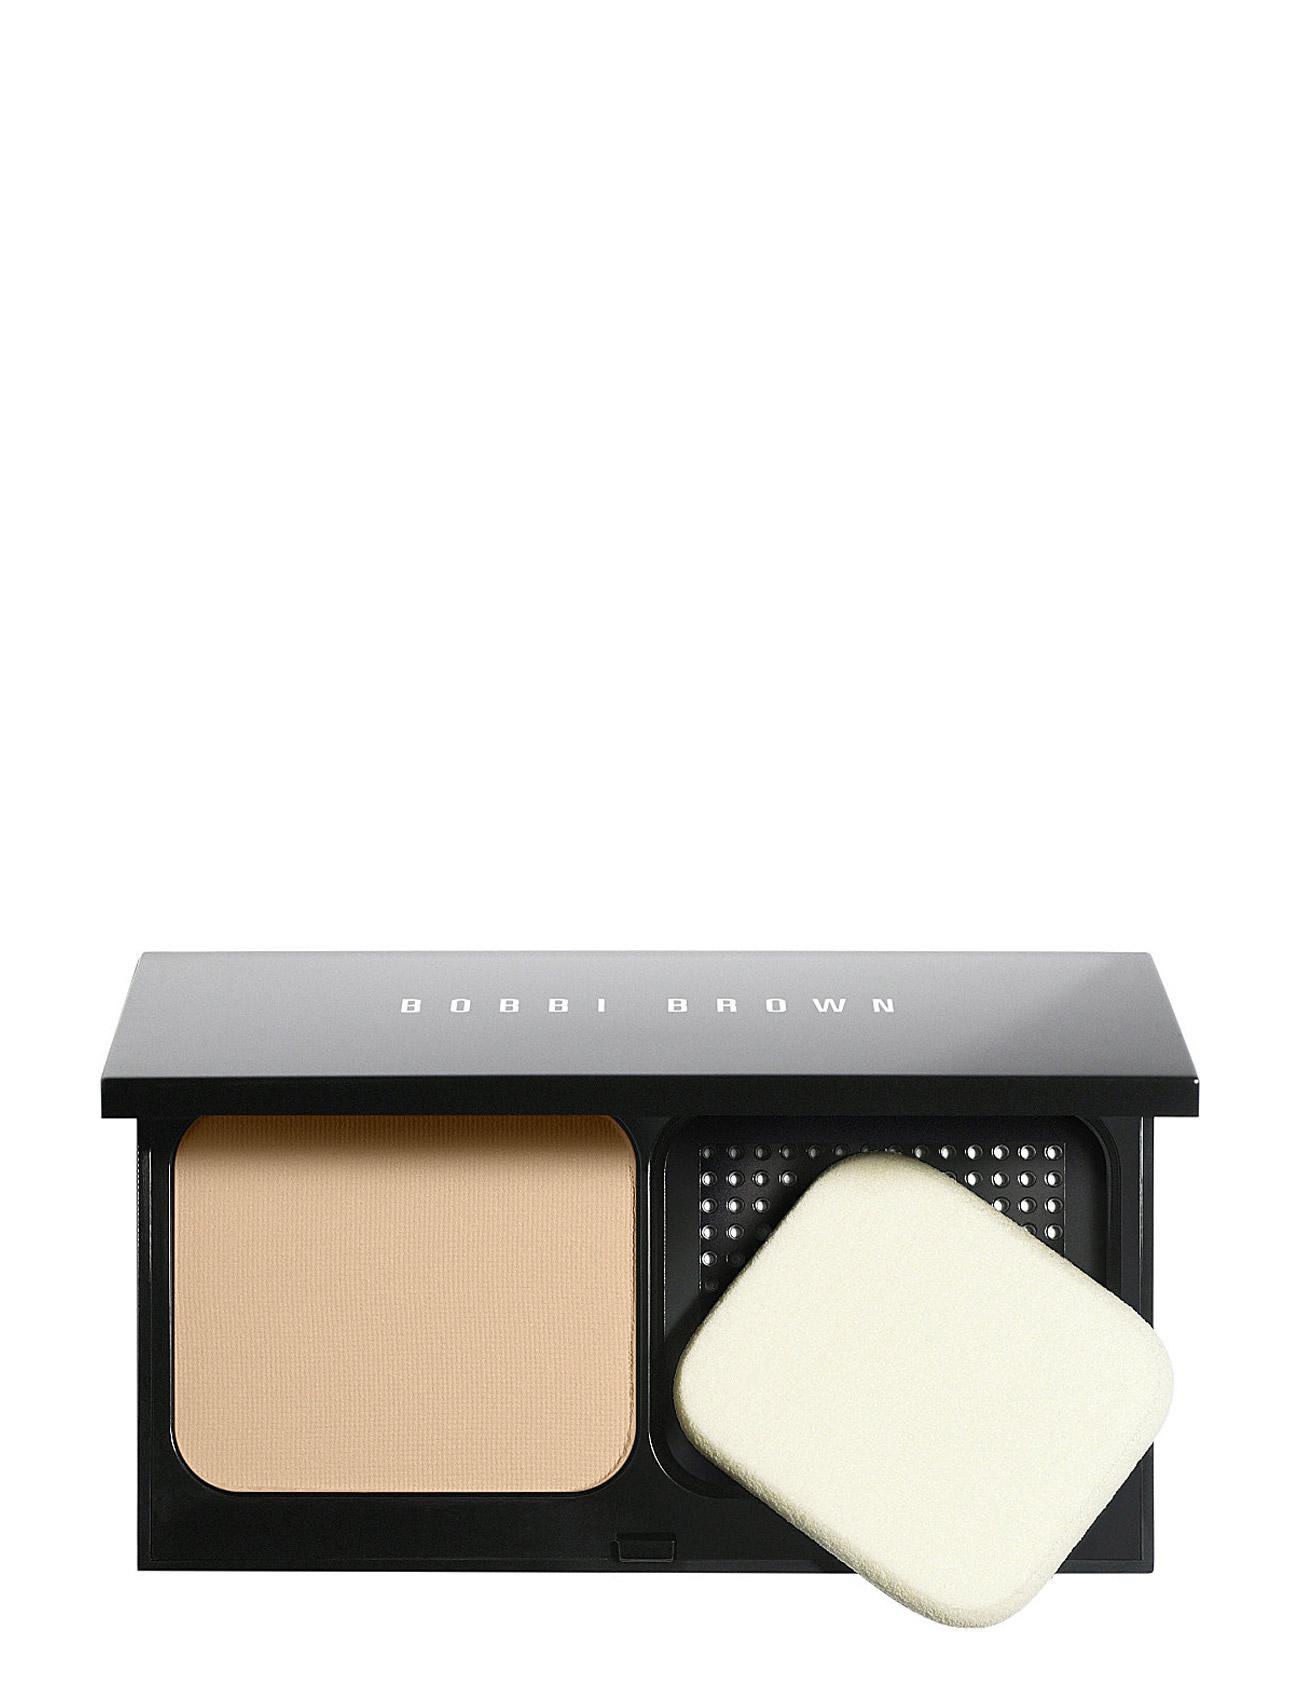 bobbi brown – Skin weightless powder foundation  sand 2 på boozt.com dk